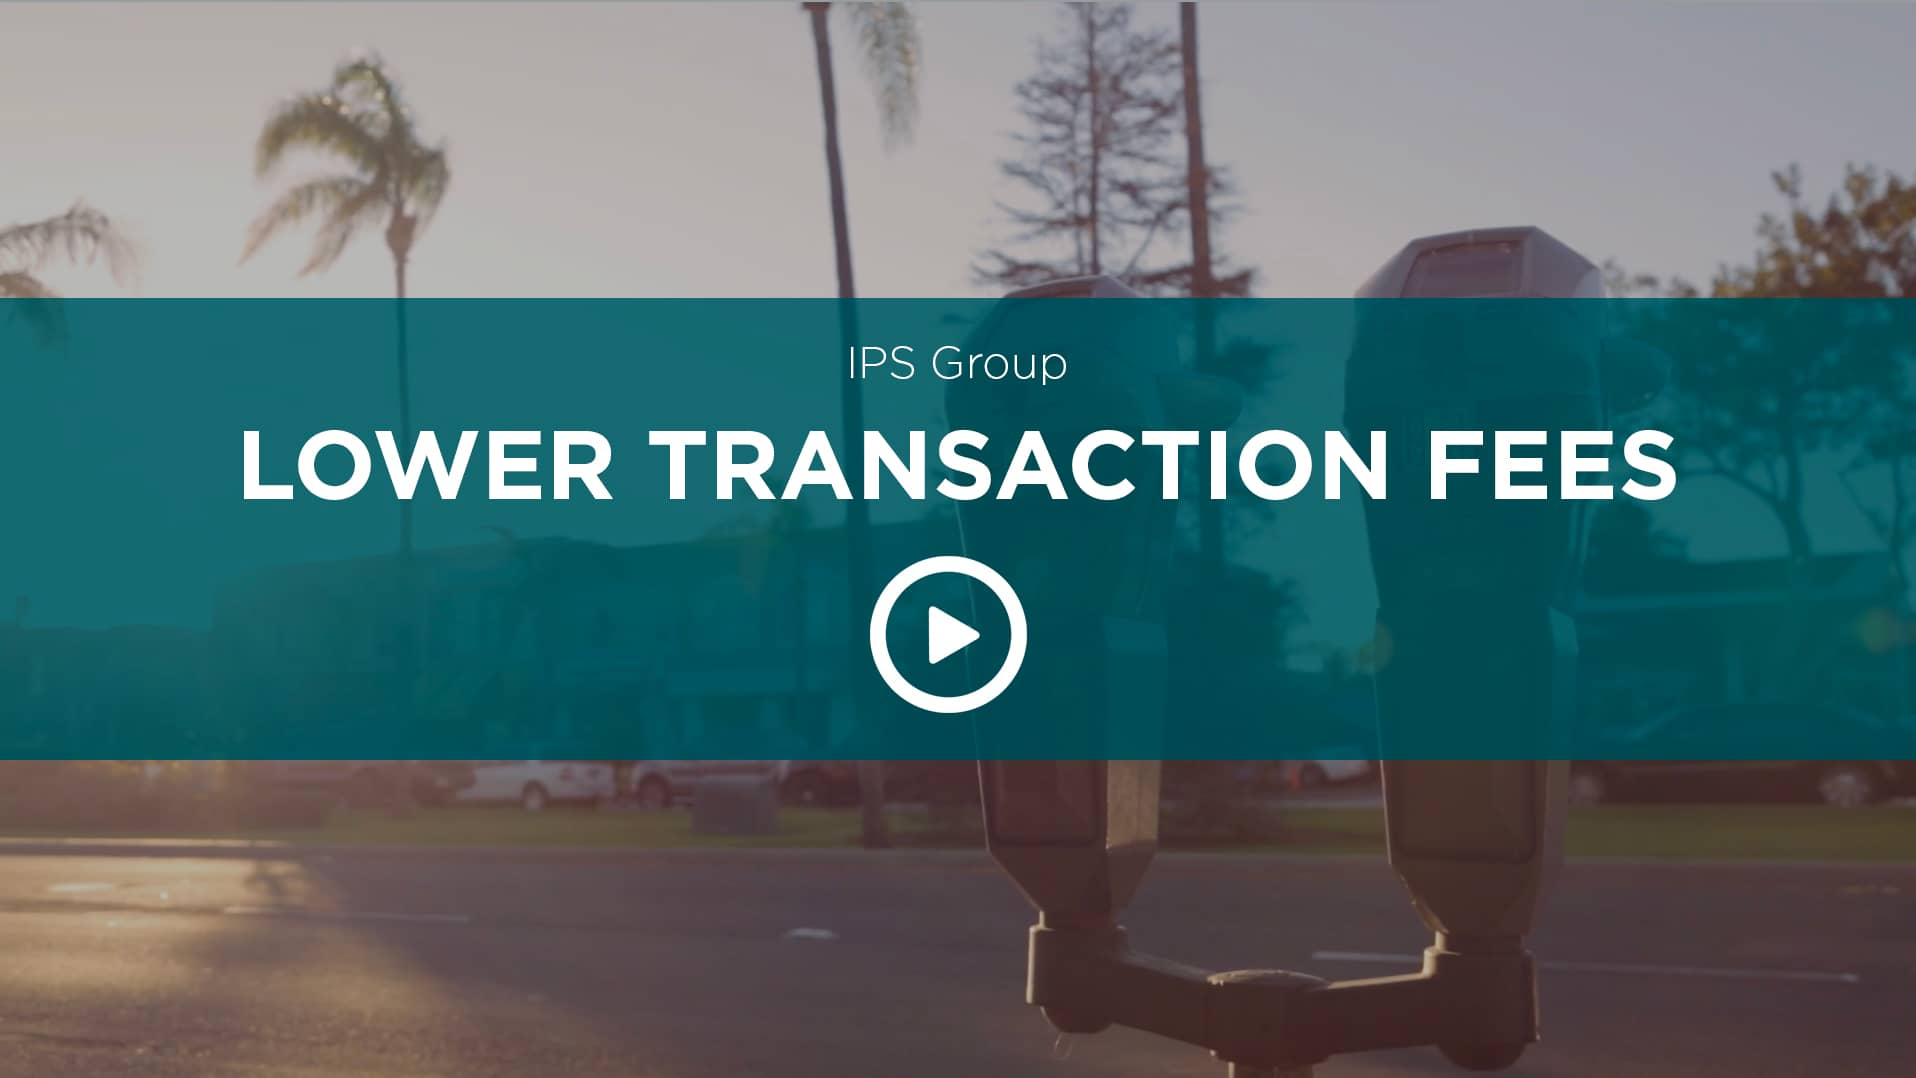 Lower Transaction Fees